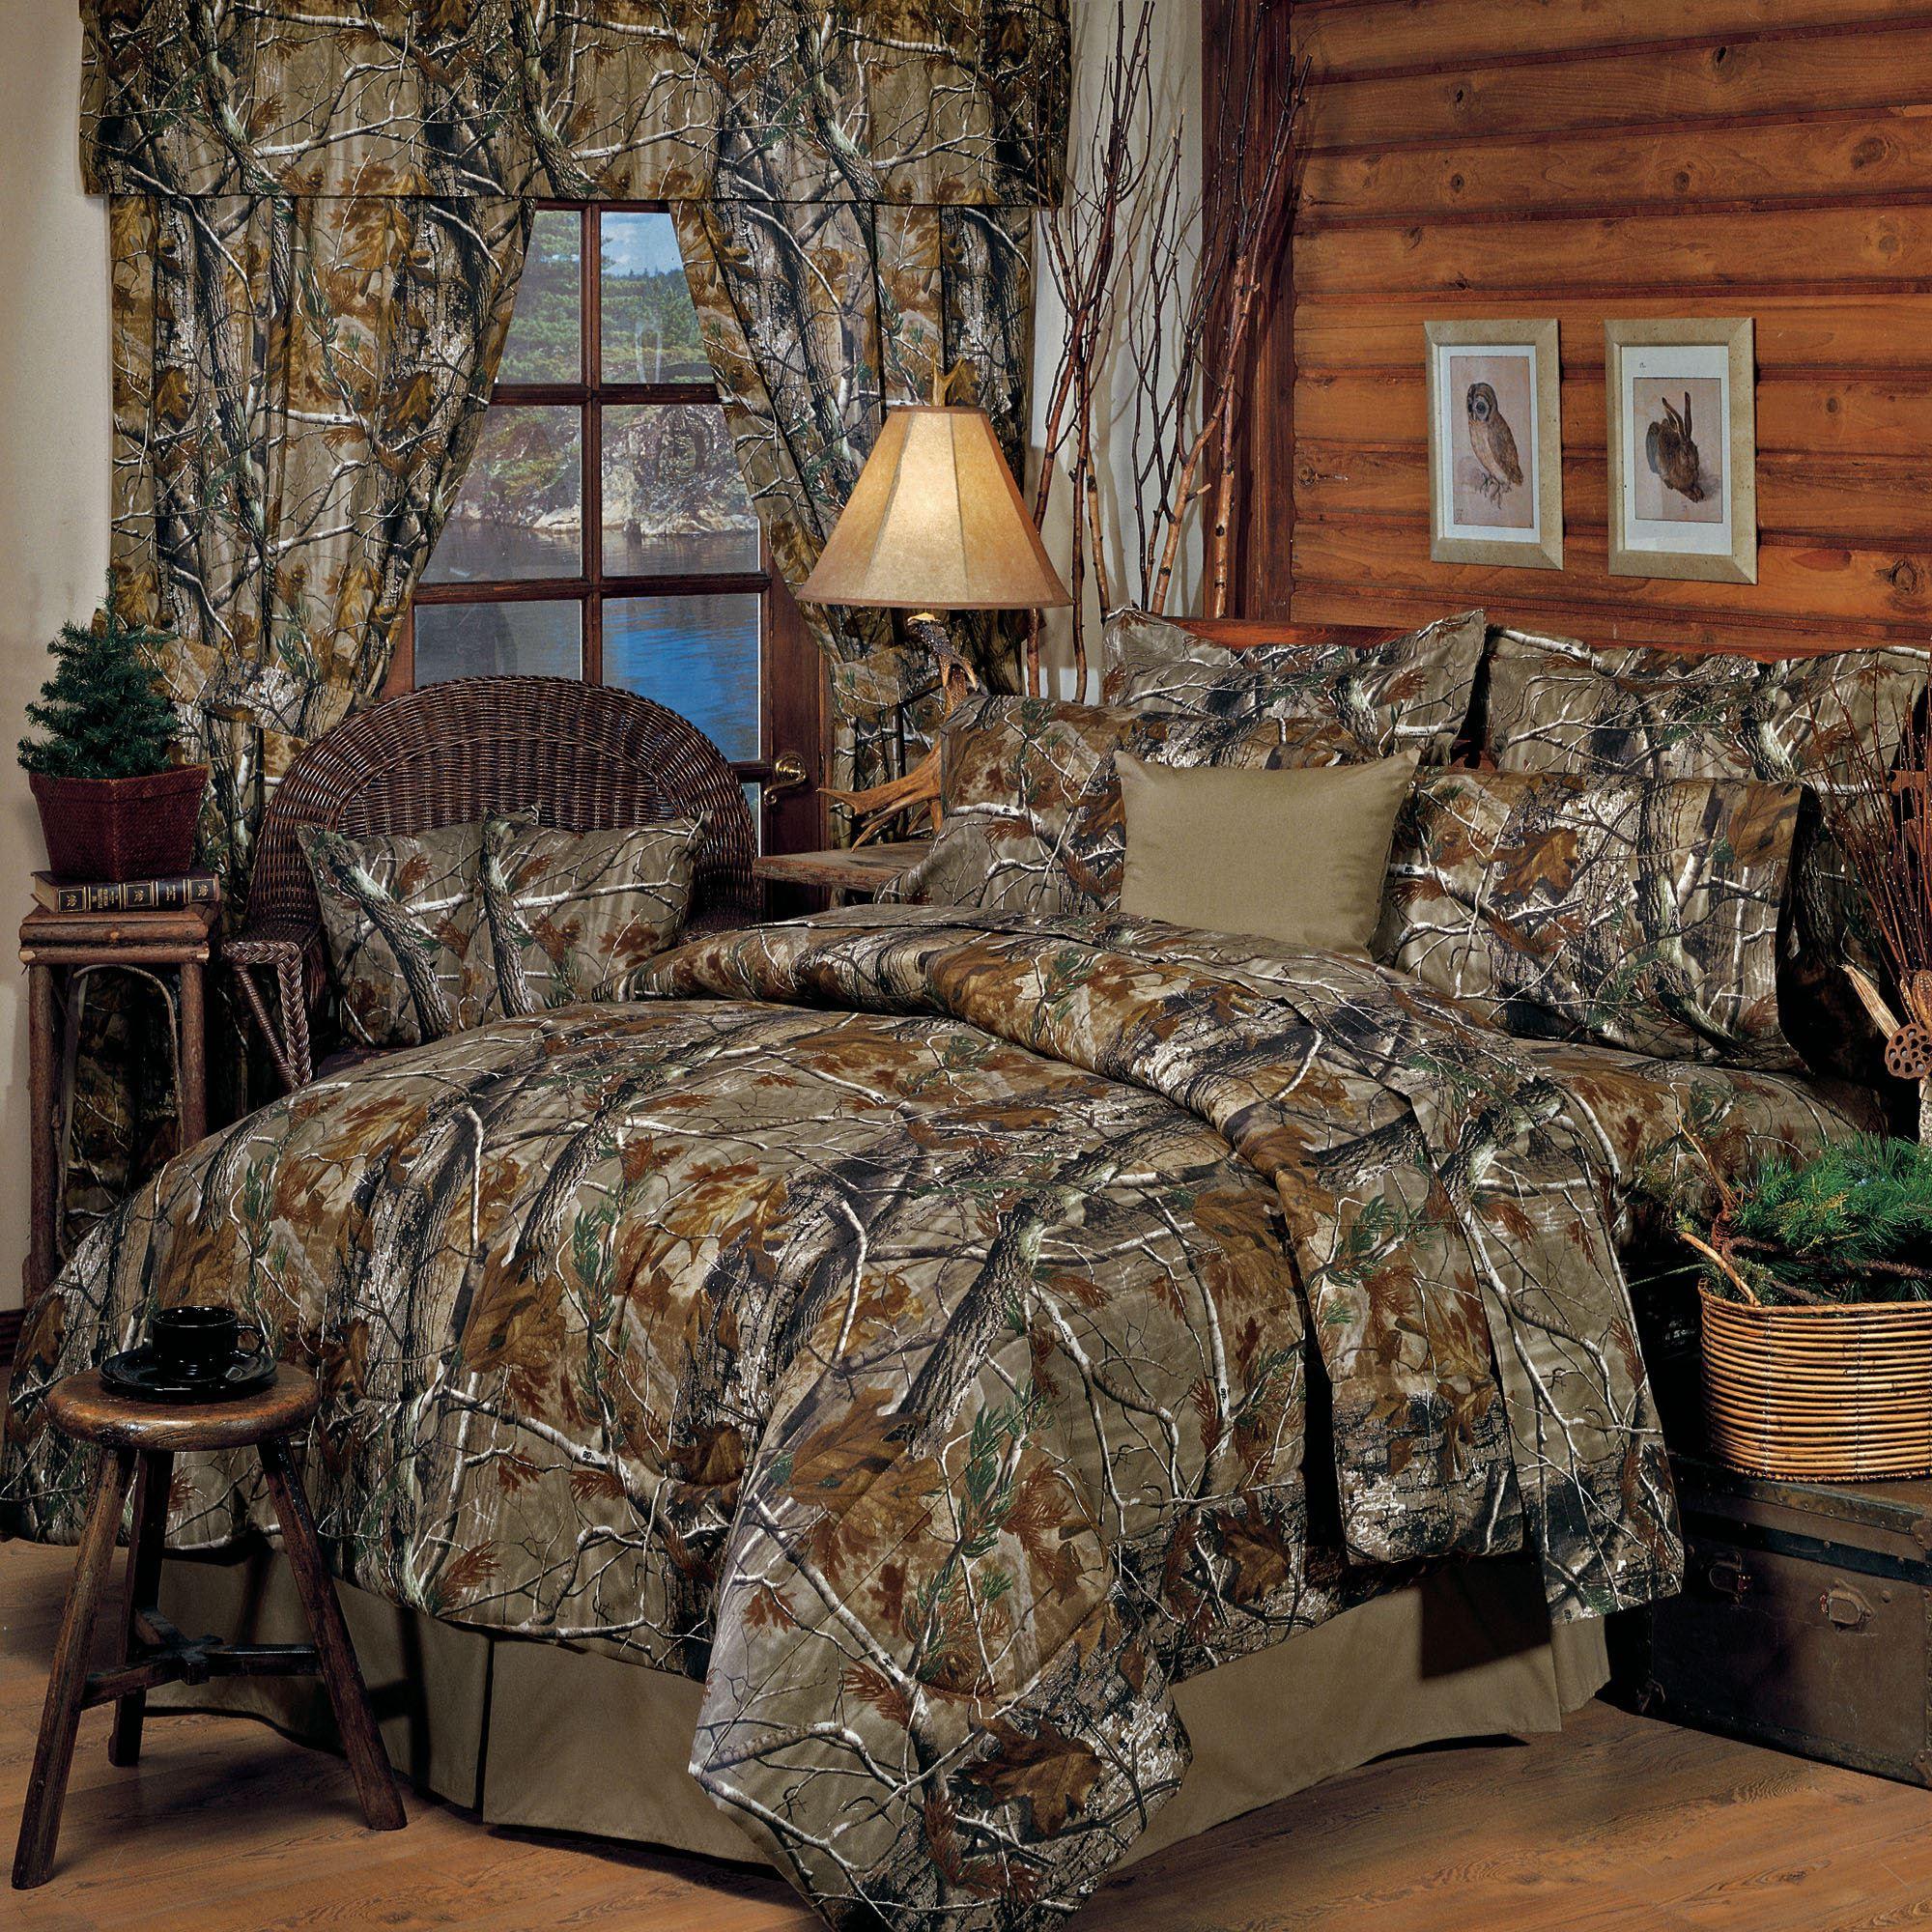 Hunting Bedding - HD Wallpaper